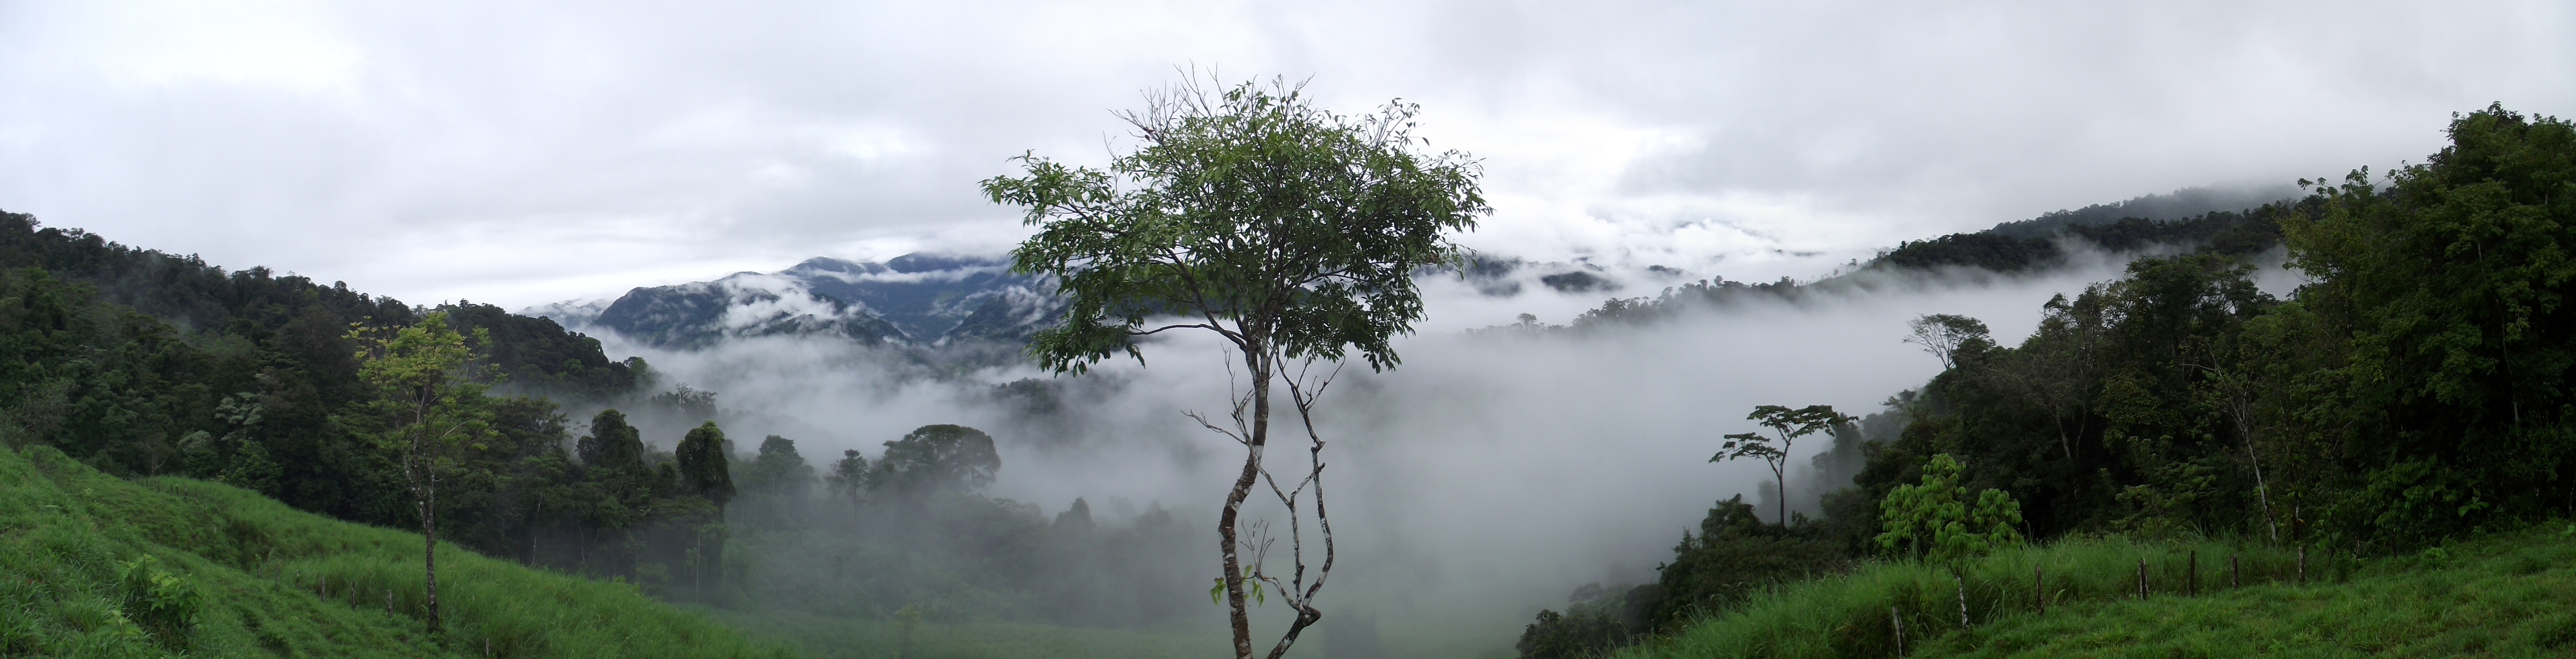 rainforest costa rica vacation coast to coast adventures